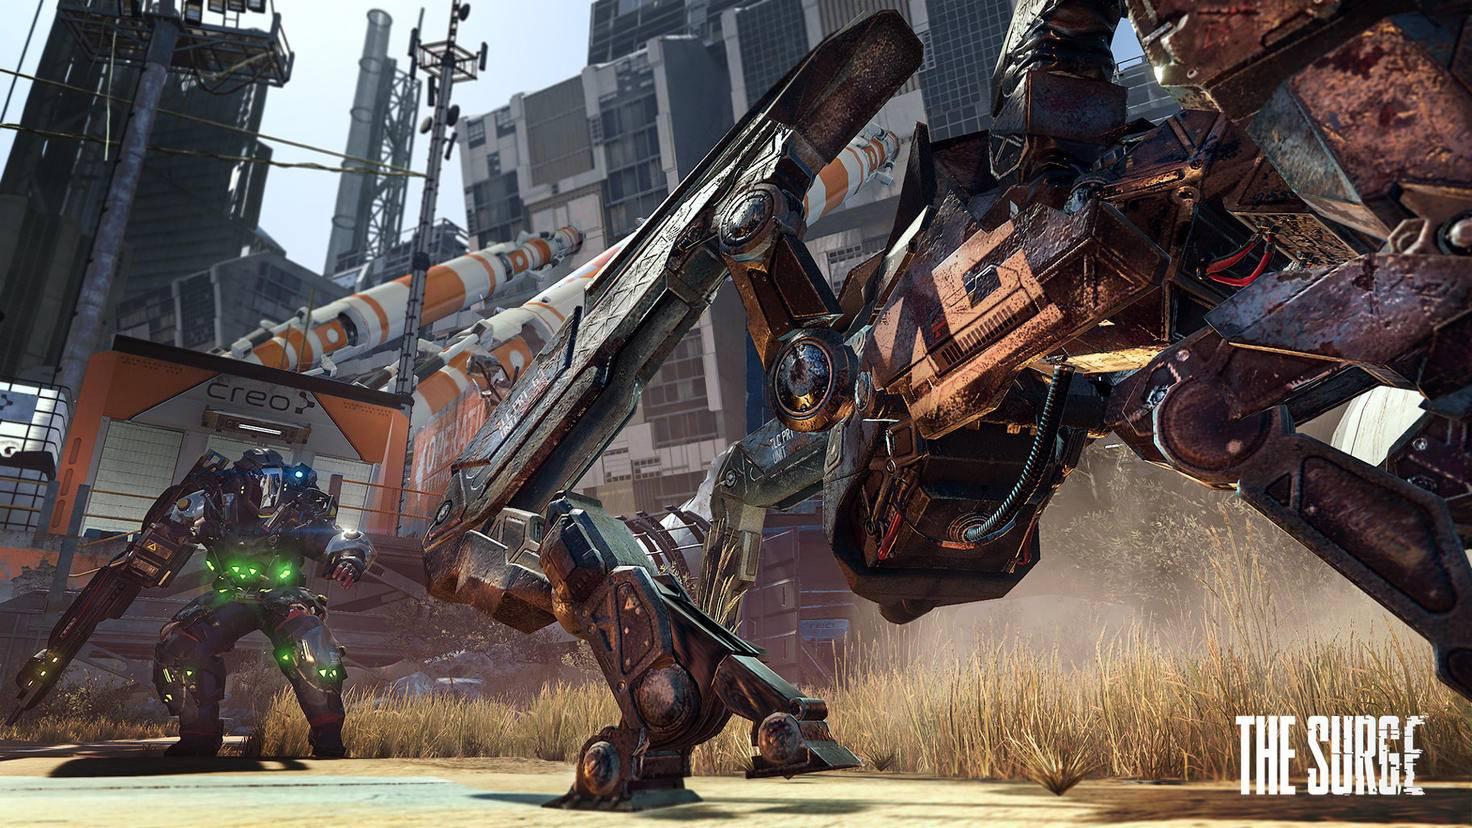 The Surge Screenshot Bossfight 02